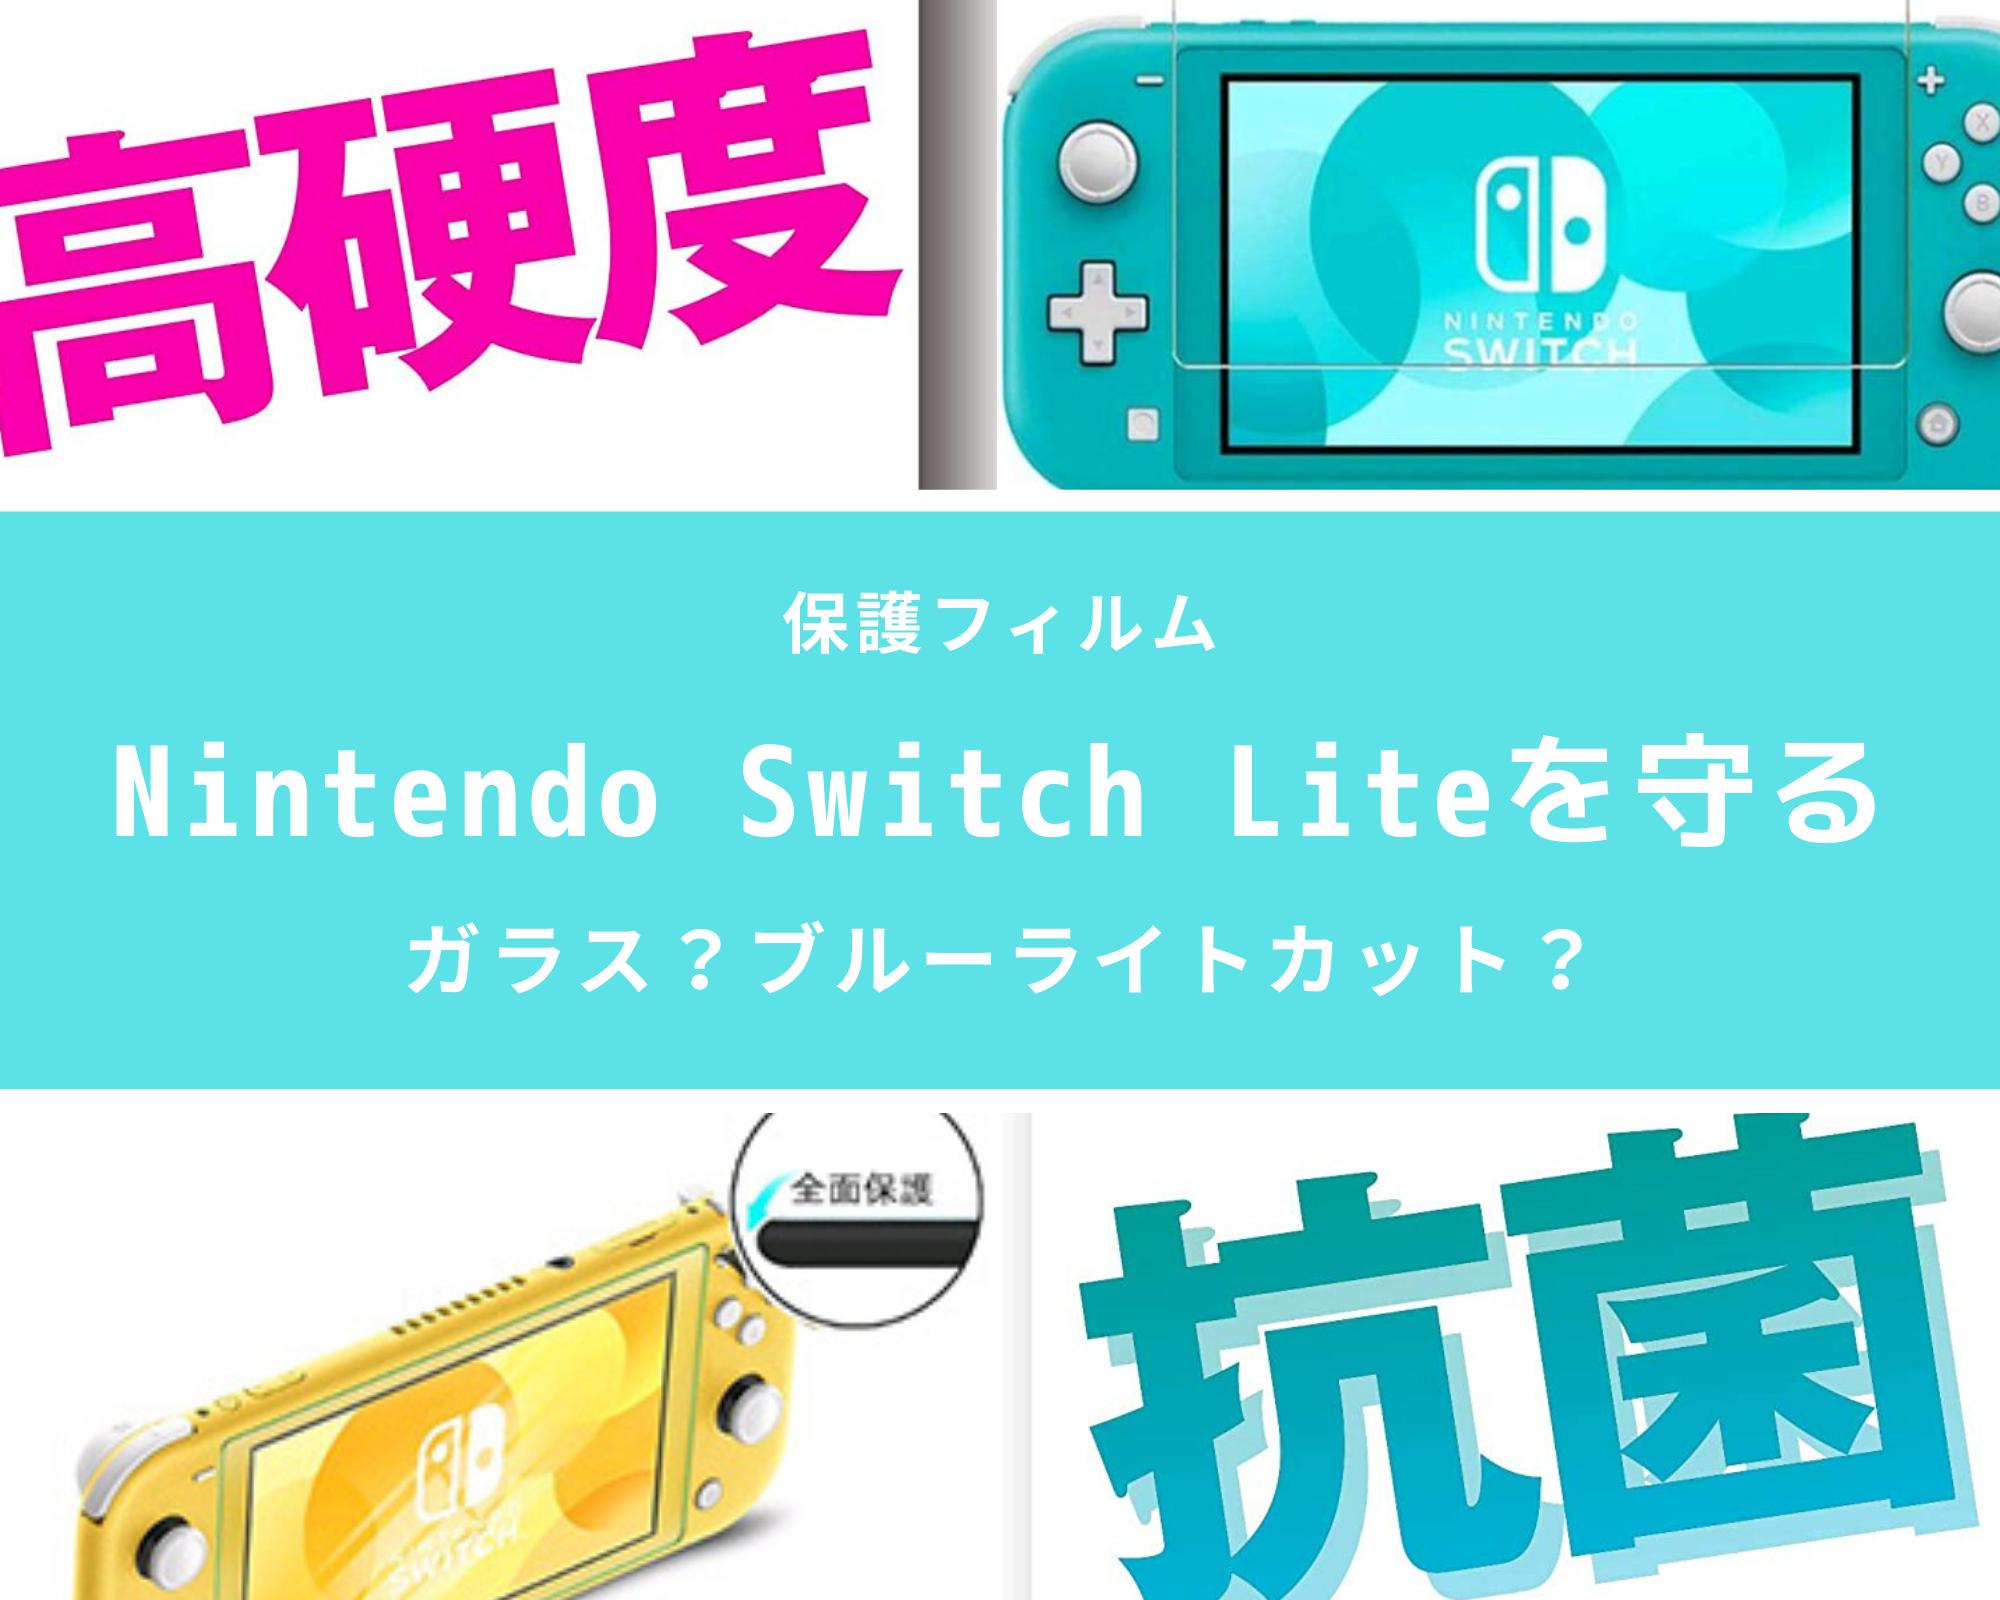 Nintendo SwitchLiteのおすすめフィルムを紹介しています